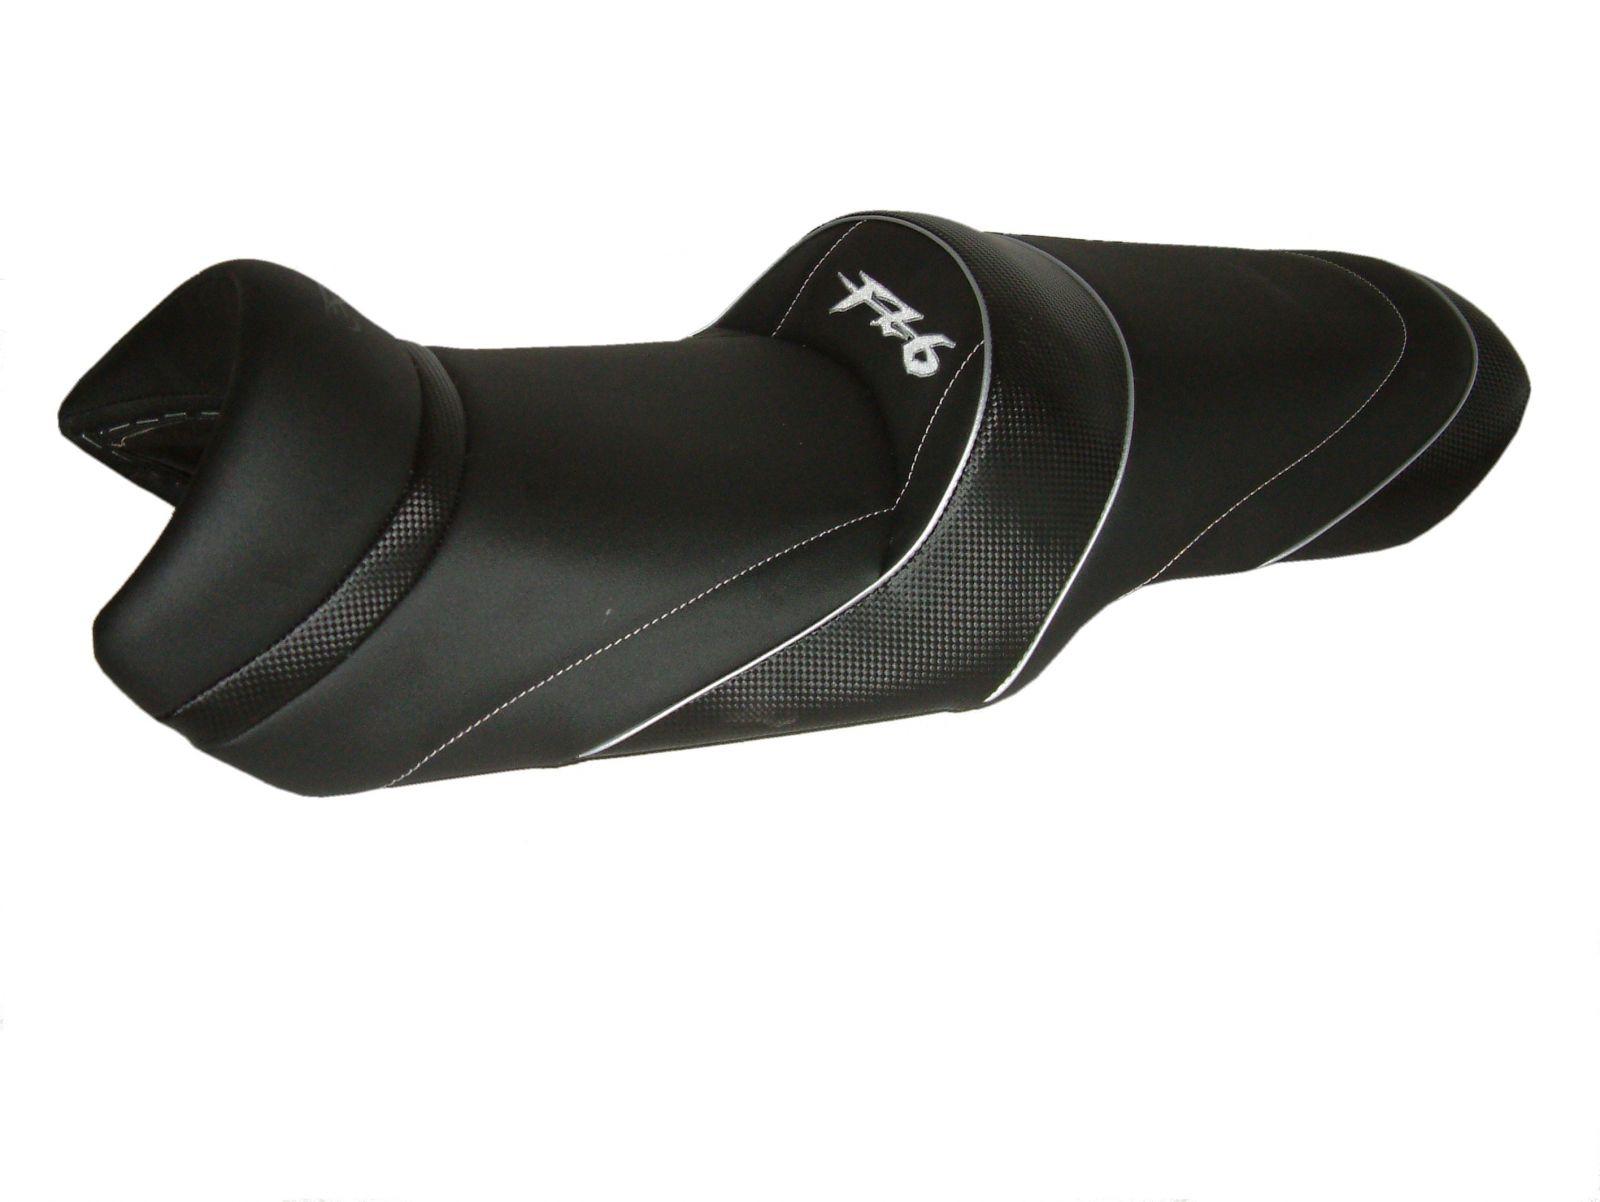 Deluxe zadel SGC1563 - YAMAHA FZ6 FAZER 600 [≥ 2003]